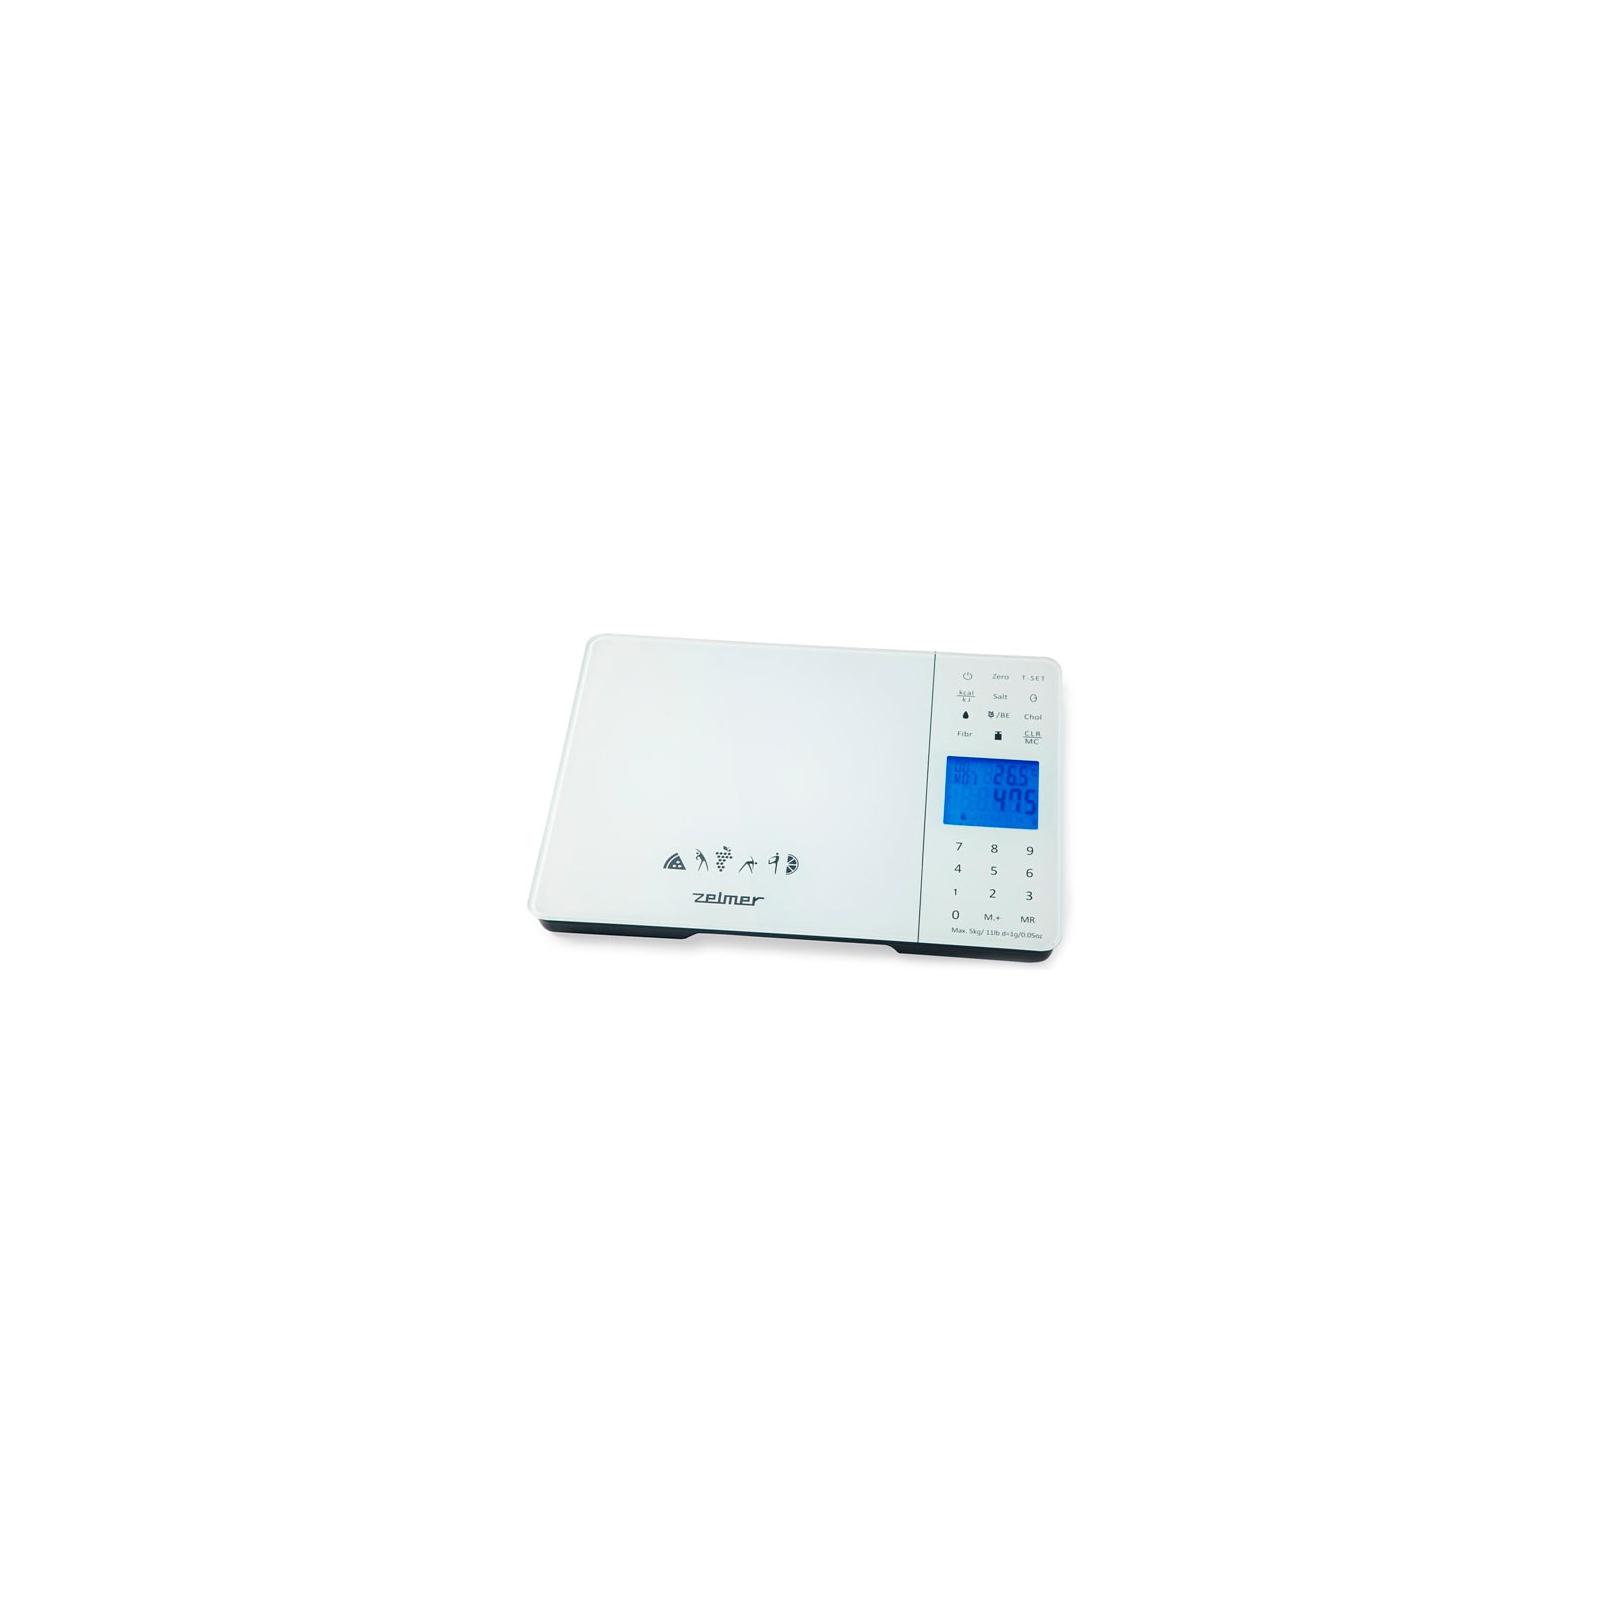 Весы кухонные Zelmer KS1700